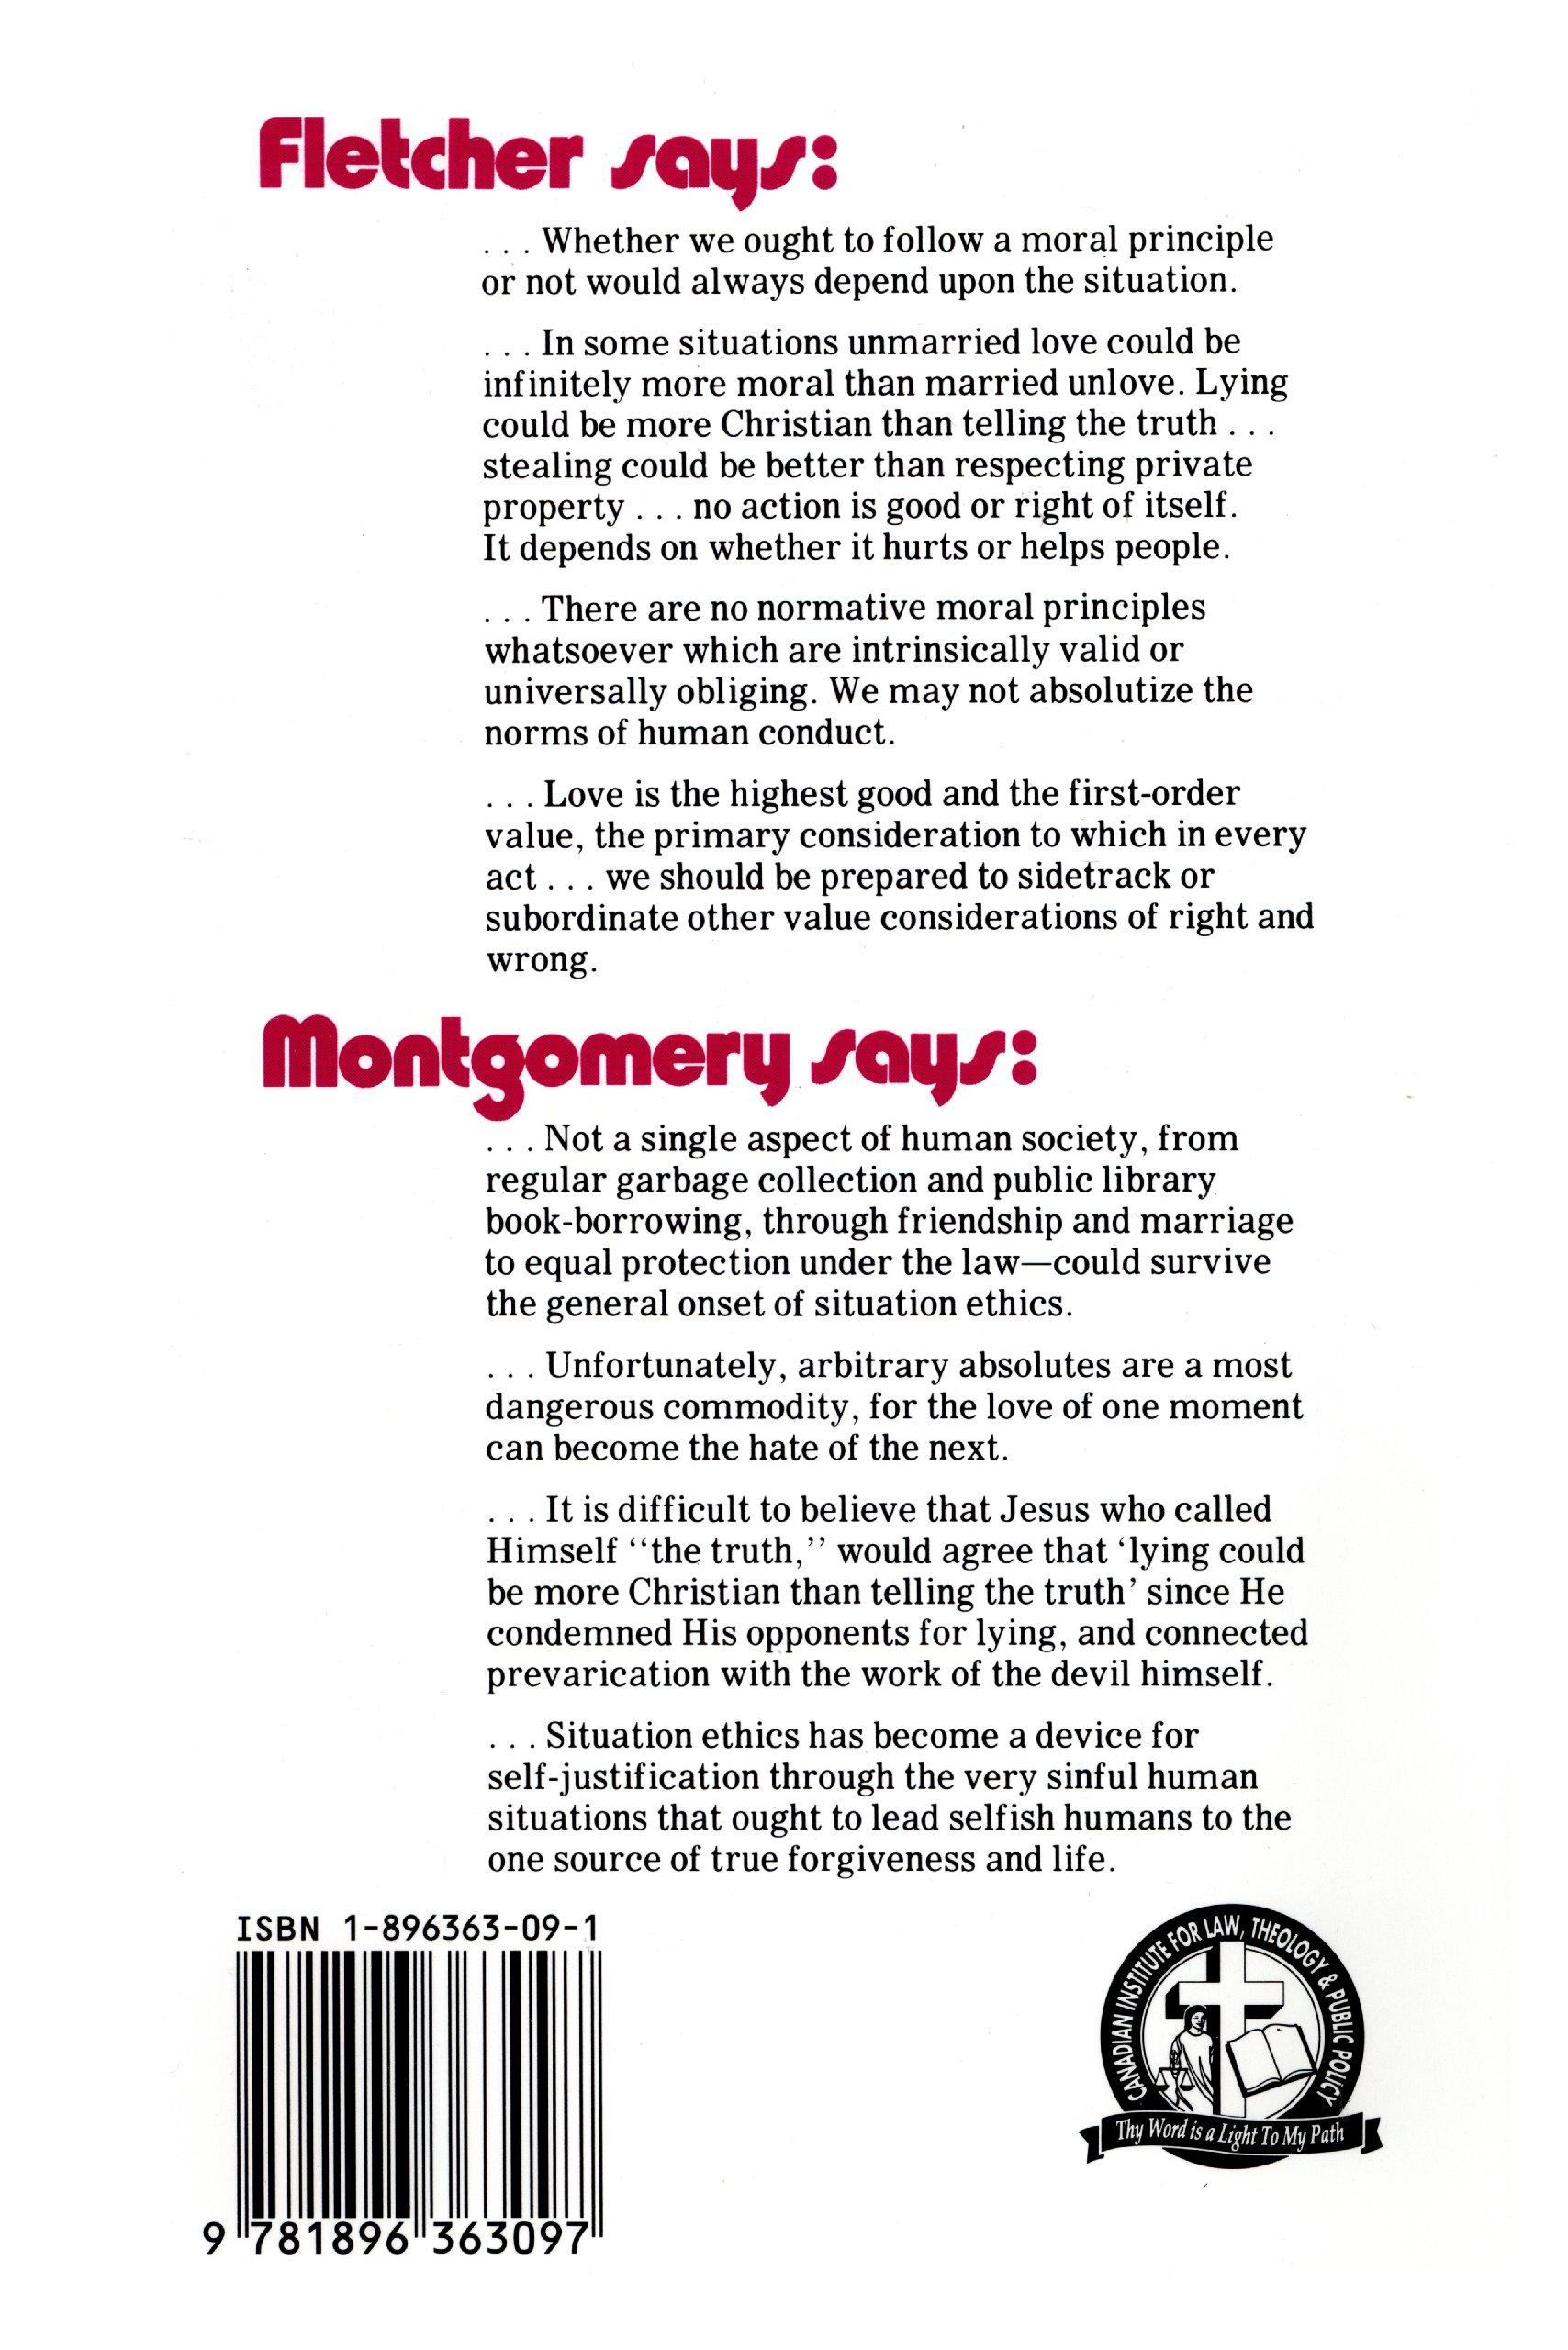 situation ethics john warwick montgomery joseph fletcher situation ethics john warwick montgomery joseph fletcher 9781896363097 com books